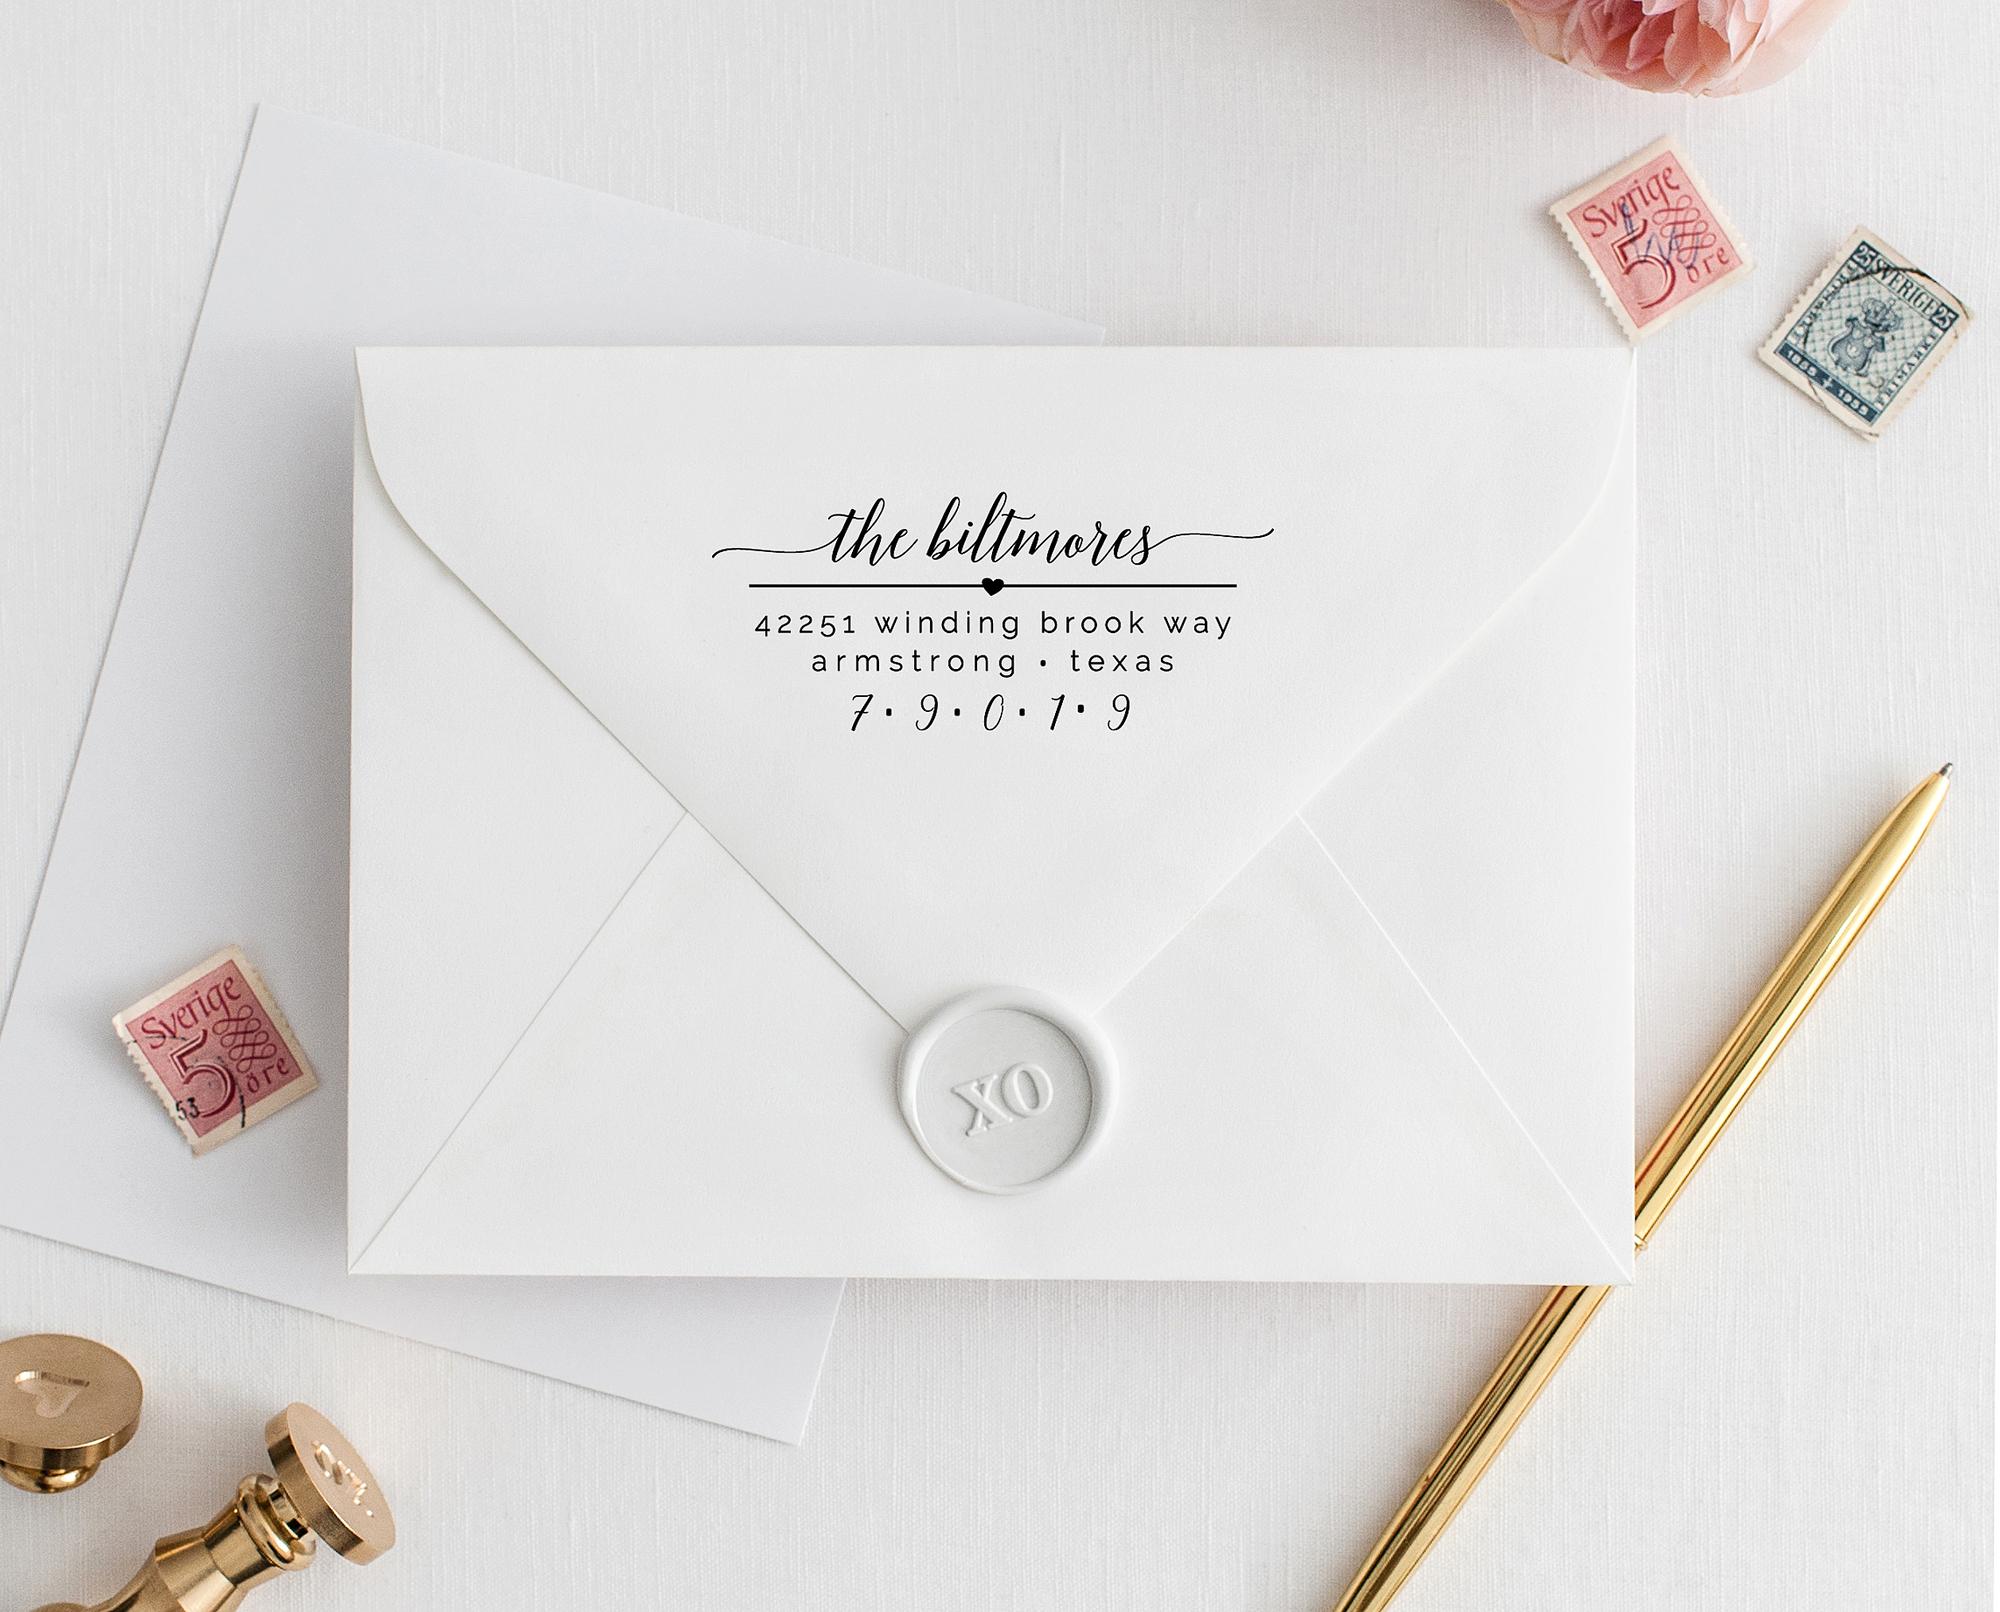 Custom Address Stamp Address Stamp No Wedding Stationery Stamper 23 Wooden Rubber Stamp Return Address Stamp Personalized Stamp